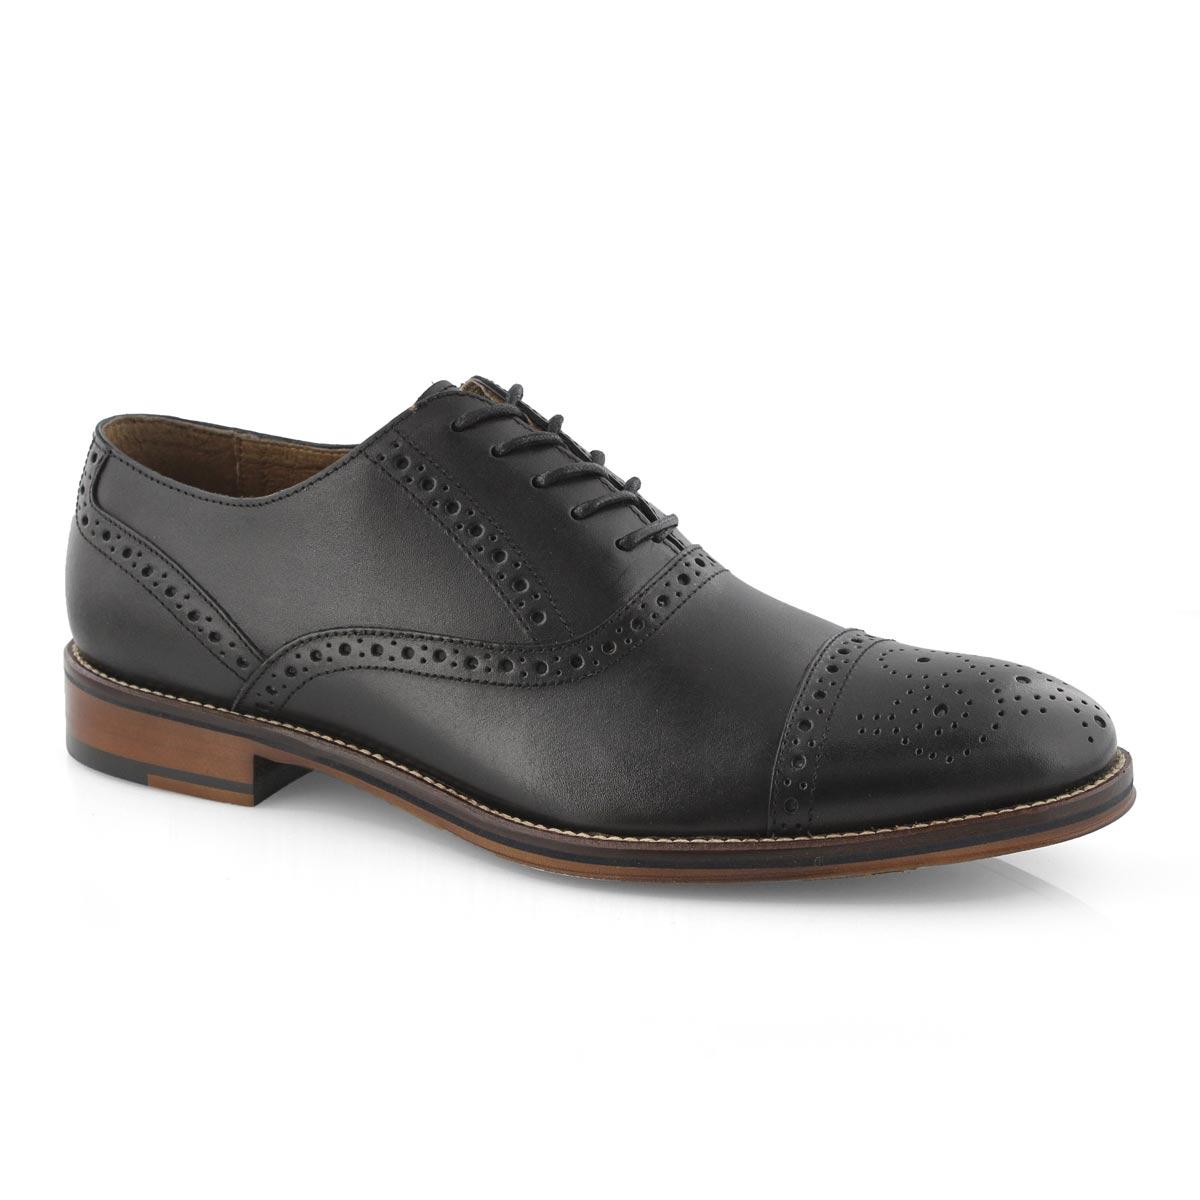 Men's Conard Cap Toe Dress Shoe - Black